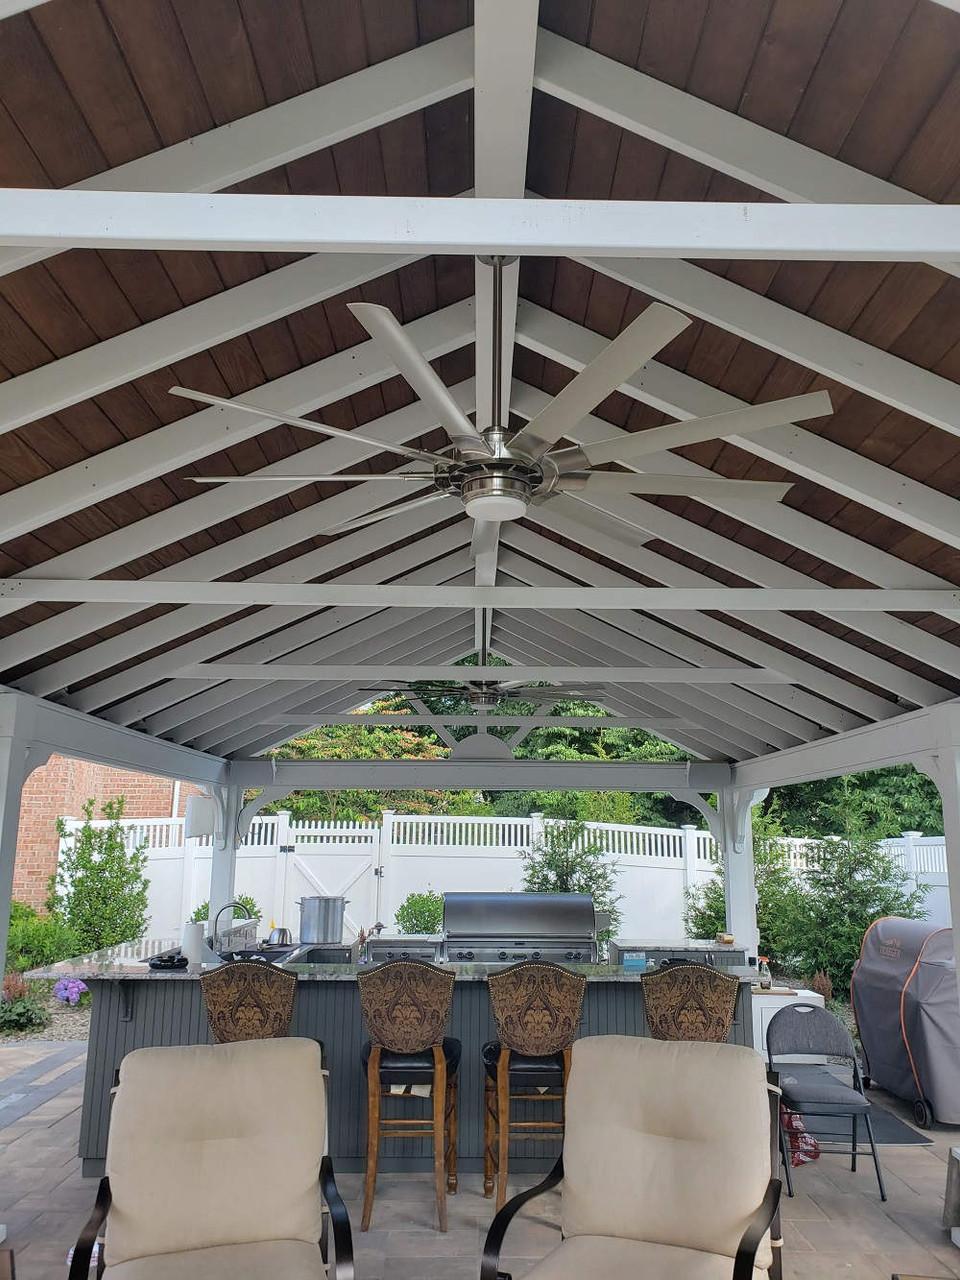 Interior of 16x30 Gable Roof Pavilion, Jenkins Township, PA